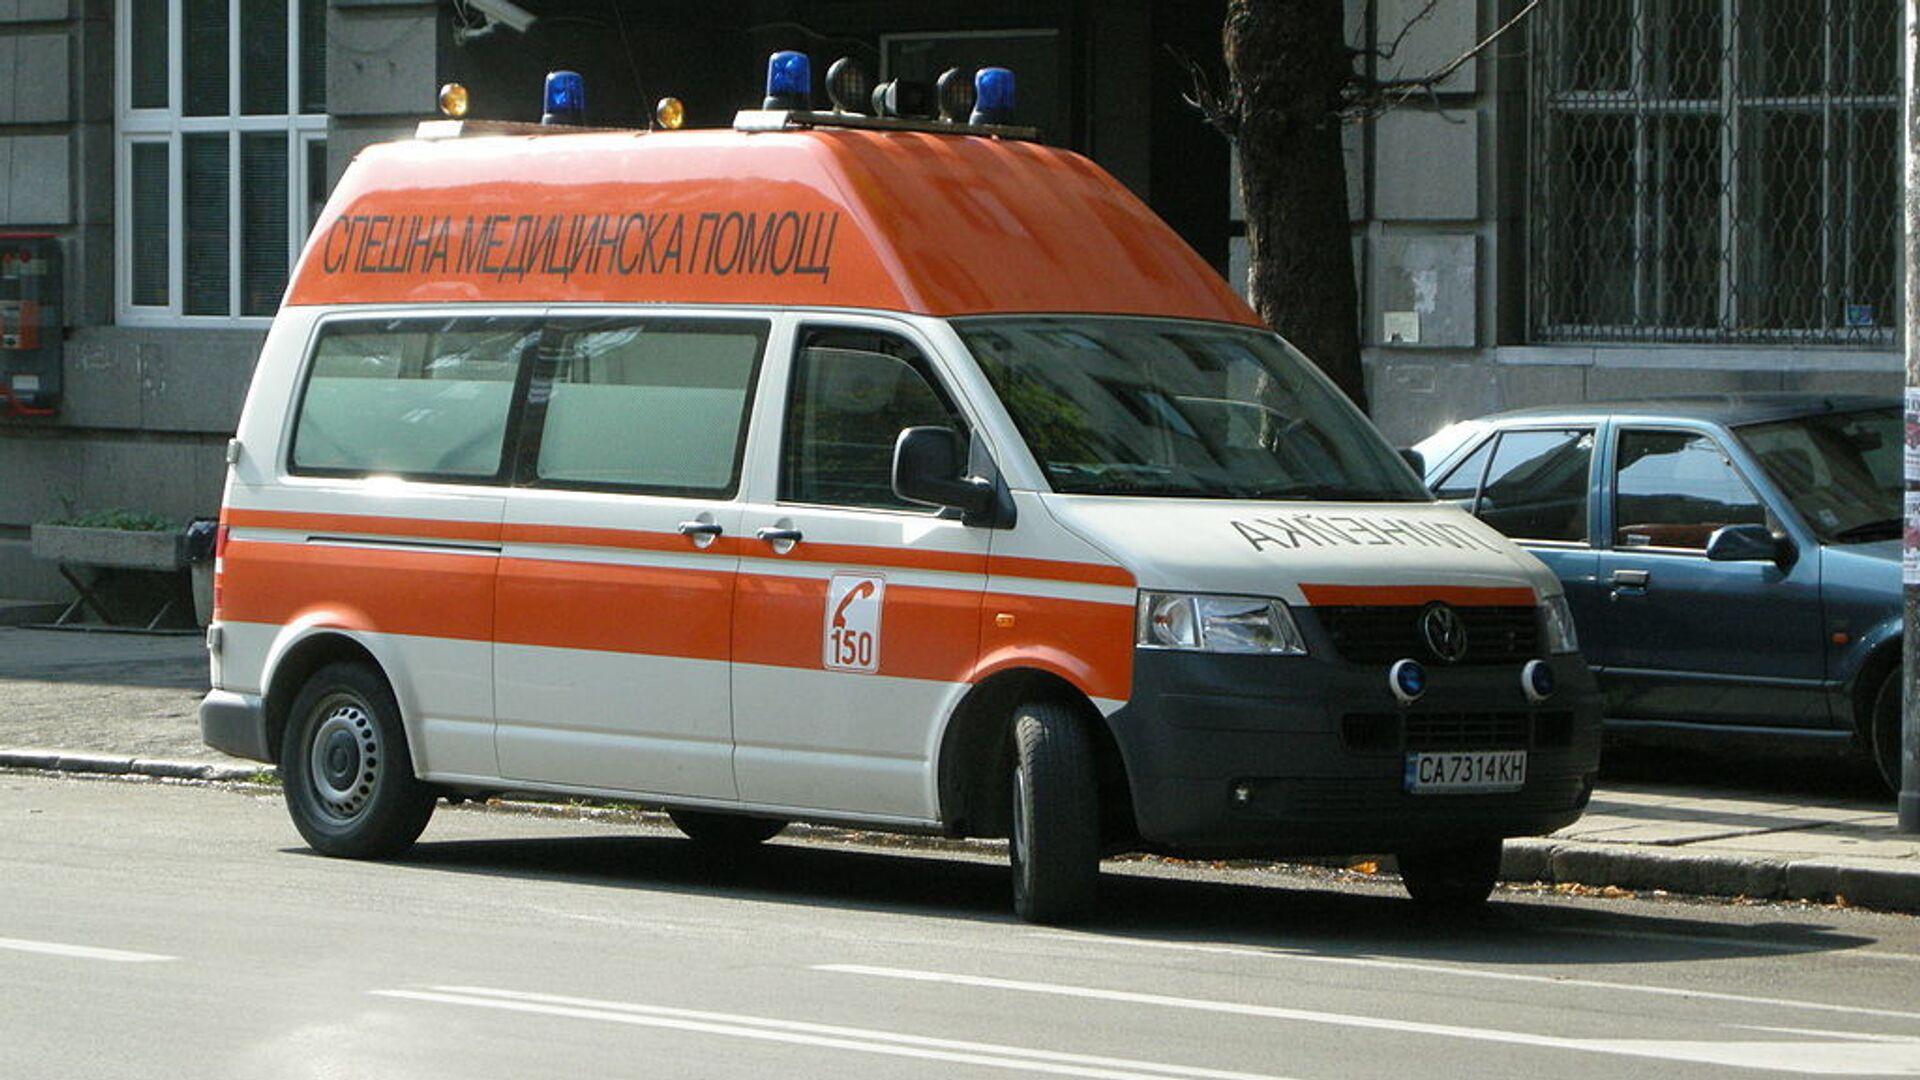 Ambulanza in Bulgaria - Sputnik Italia, 1920, 20.05.2021